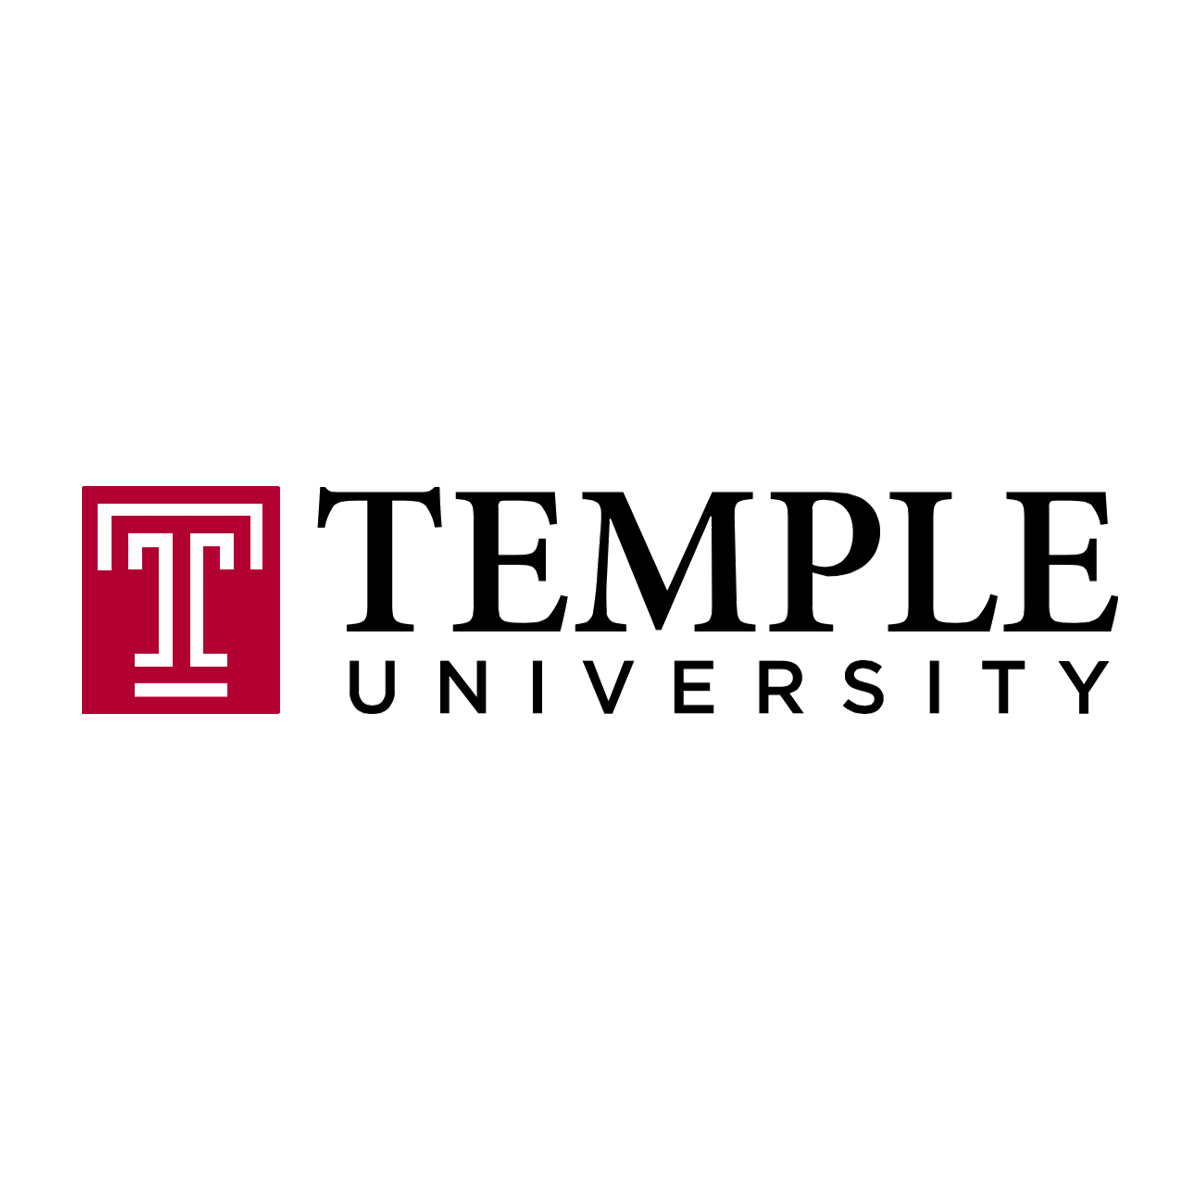 temple_b2bsitelogo.jpg